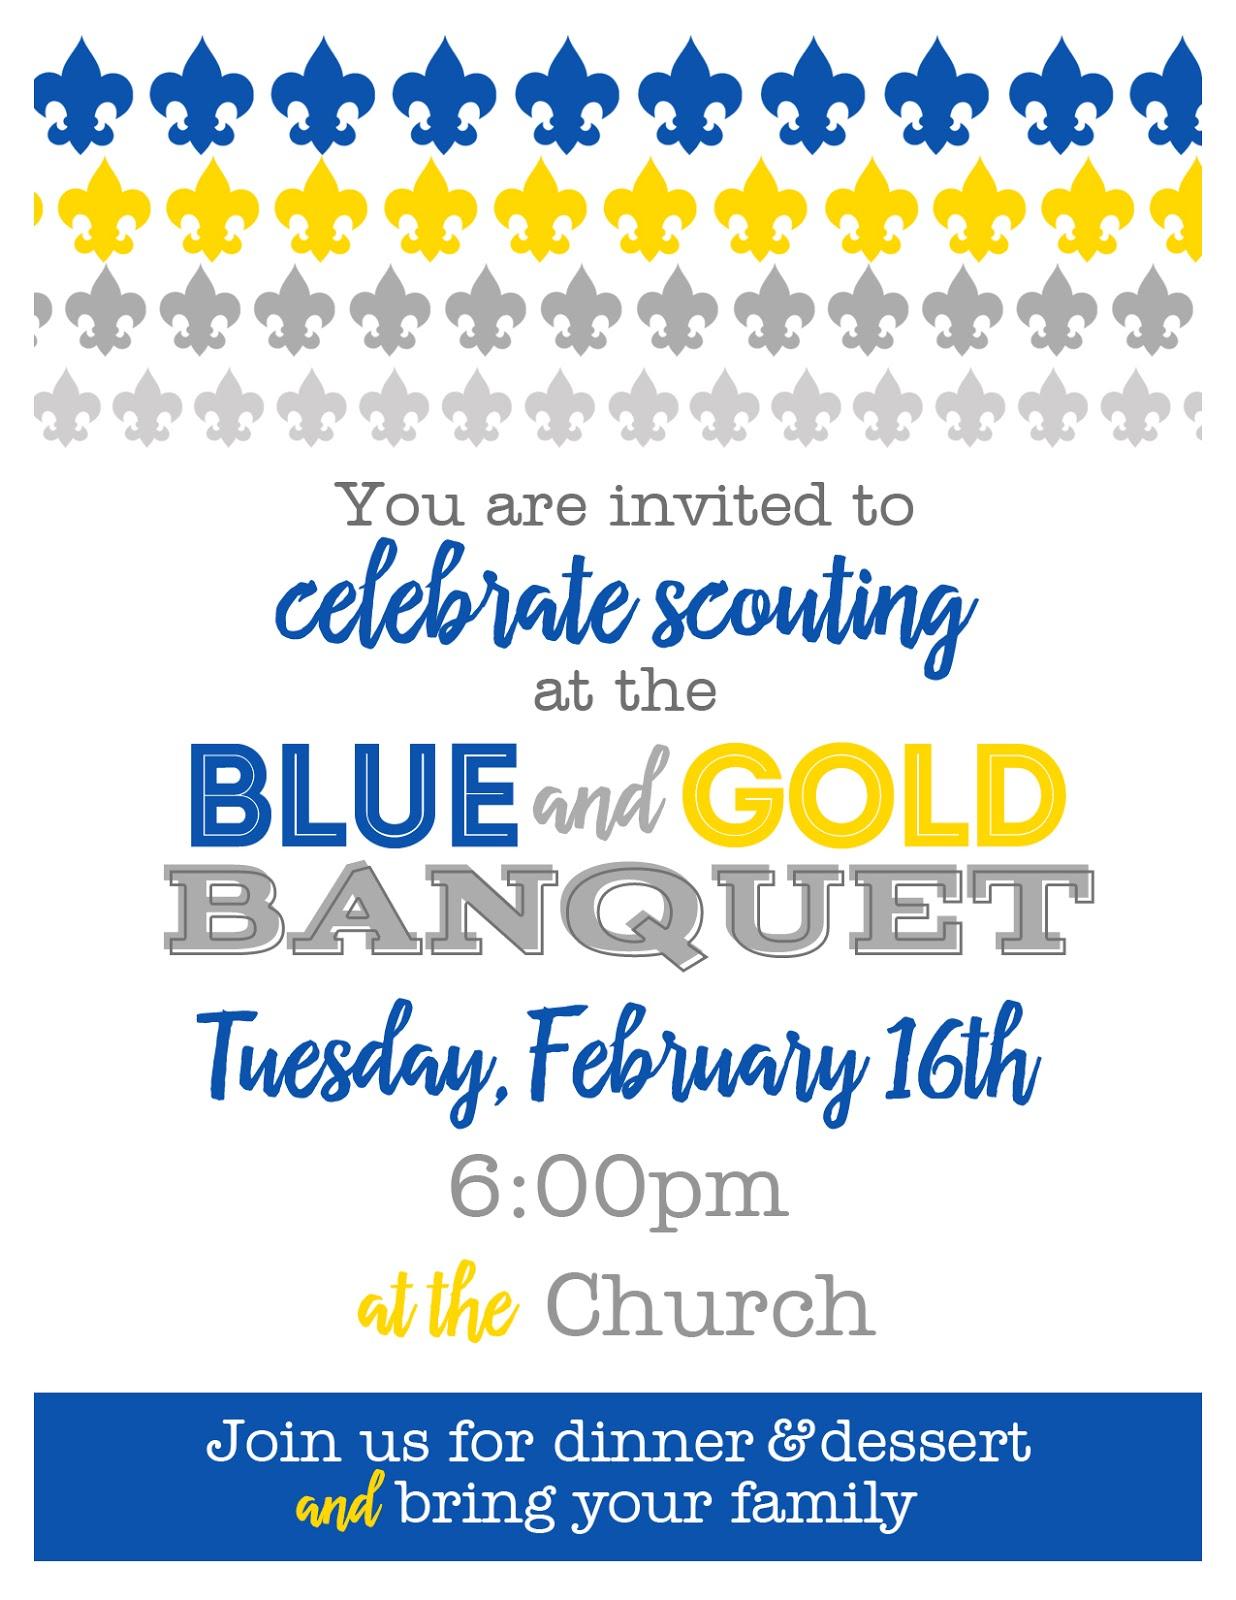 Kelli Nicholls Designs Cub Scout Blue And Gold Banquet Invitation